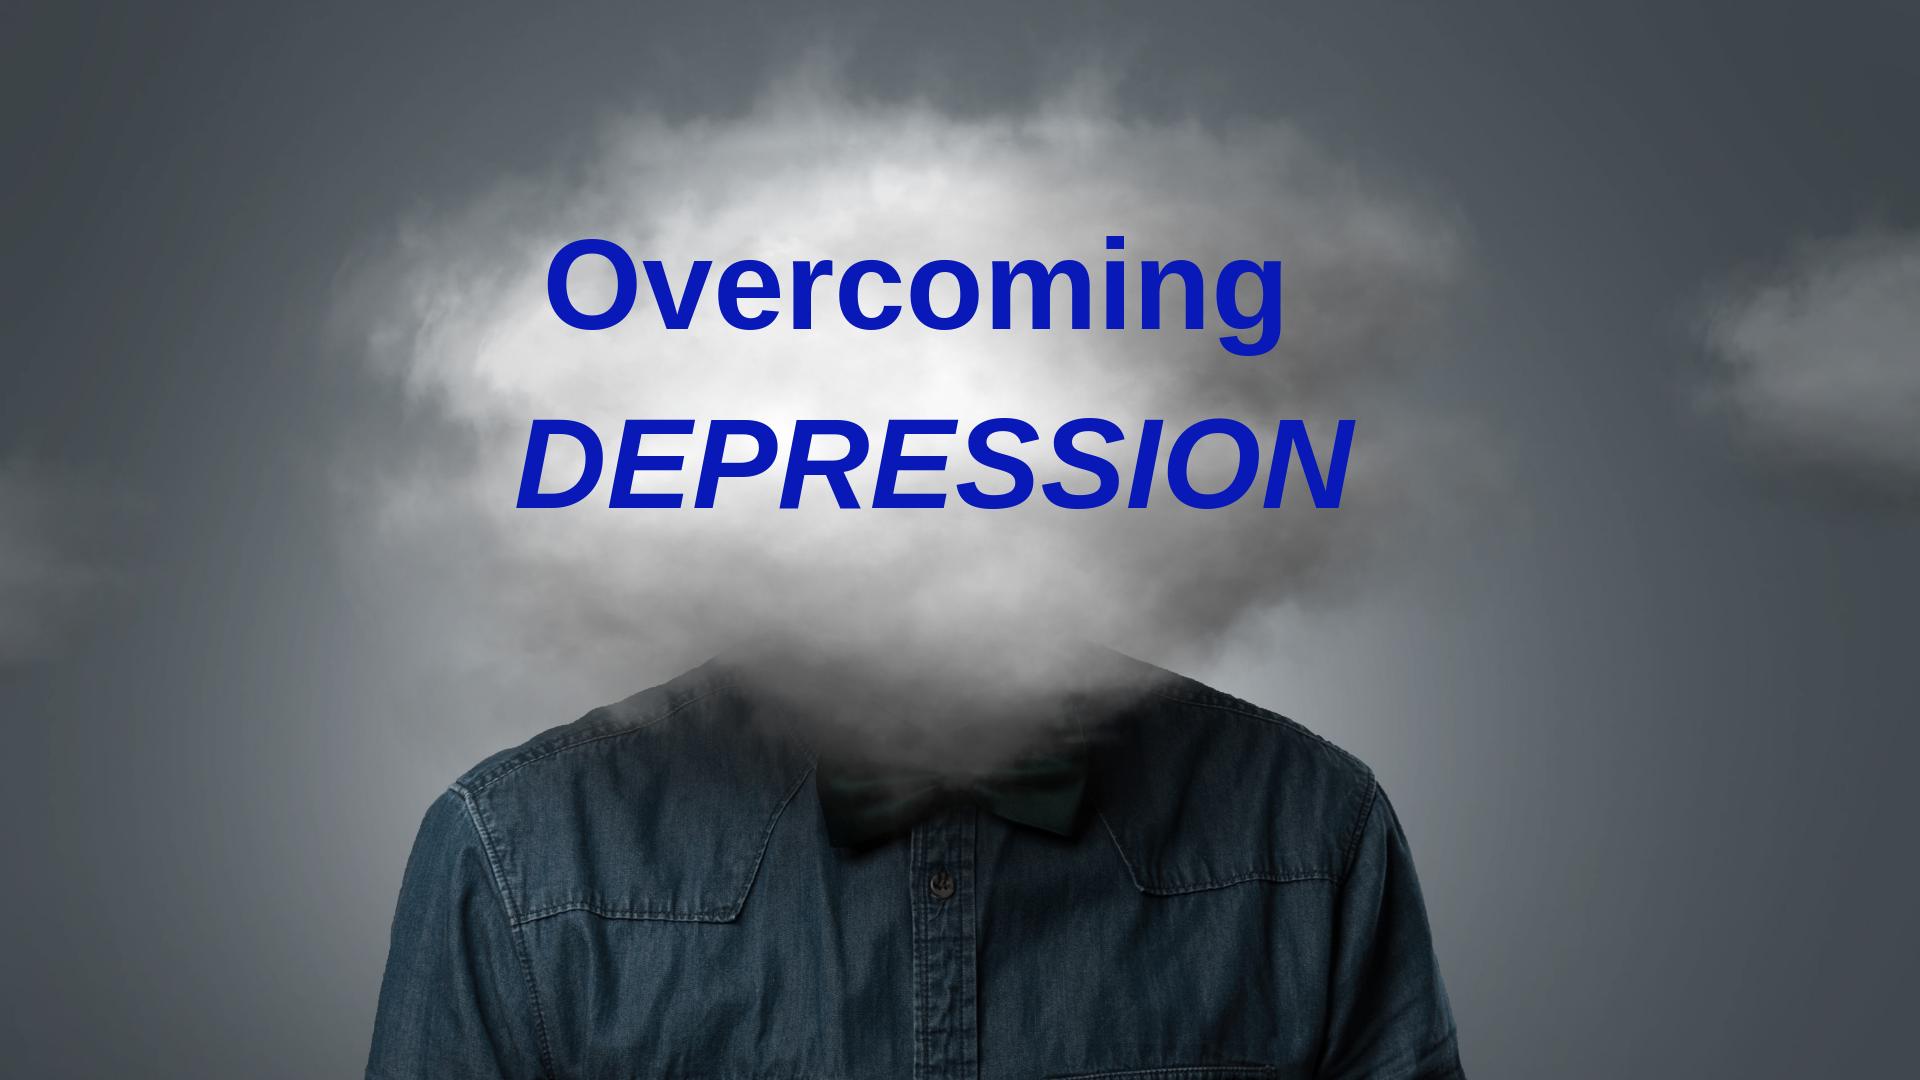 Overcoming Depression - Graphic Stock